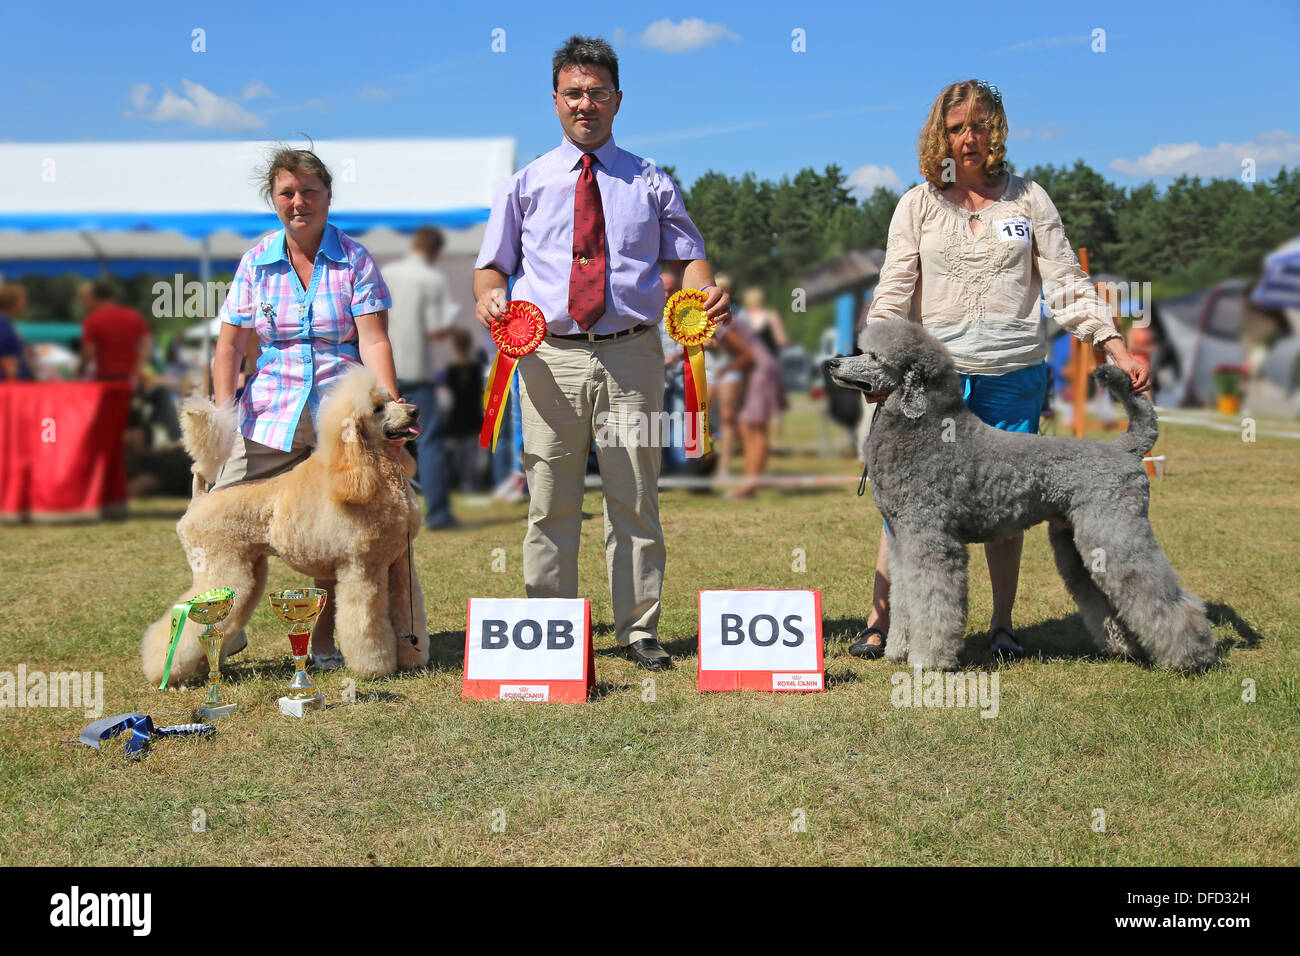 Dog Show - rewarding apricot and blue royal poodles - Stock Image